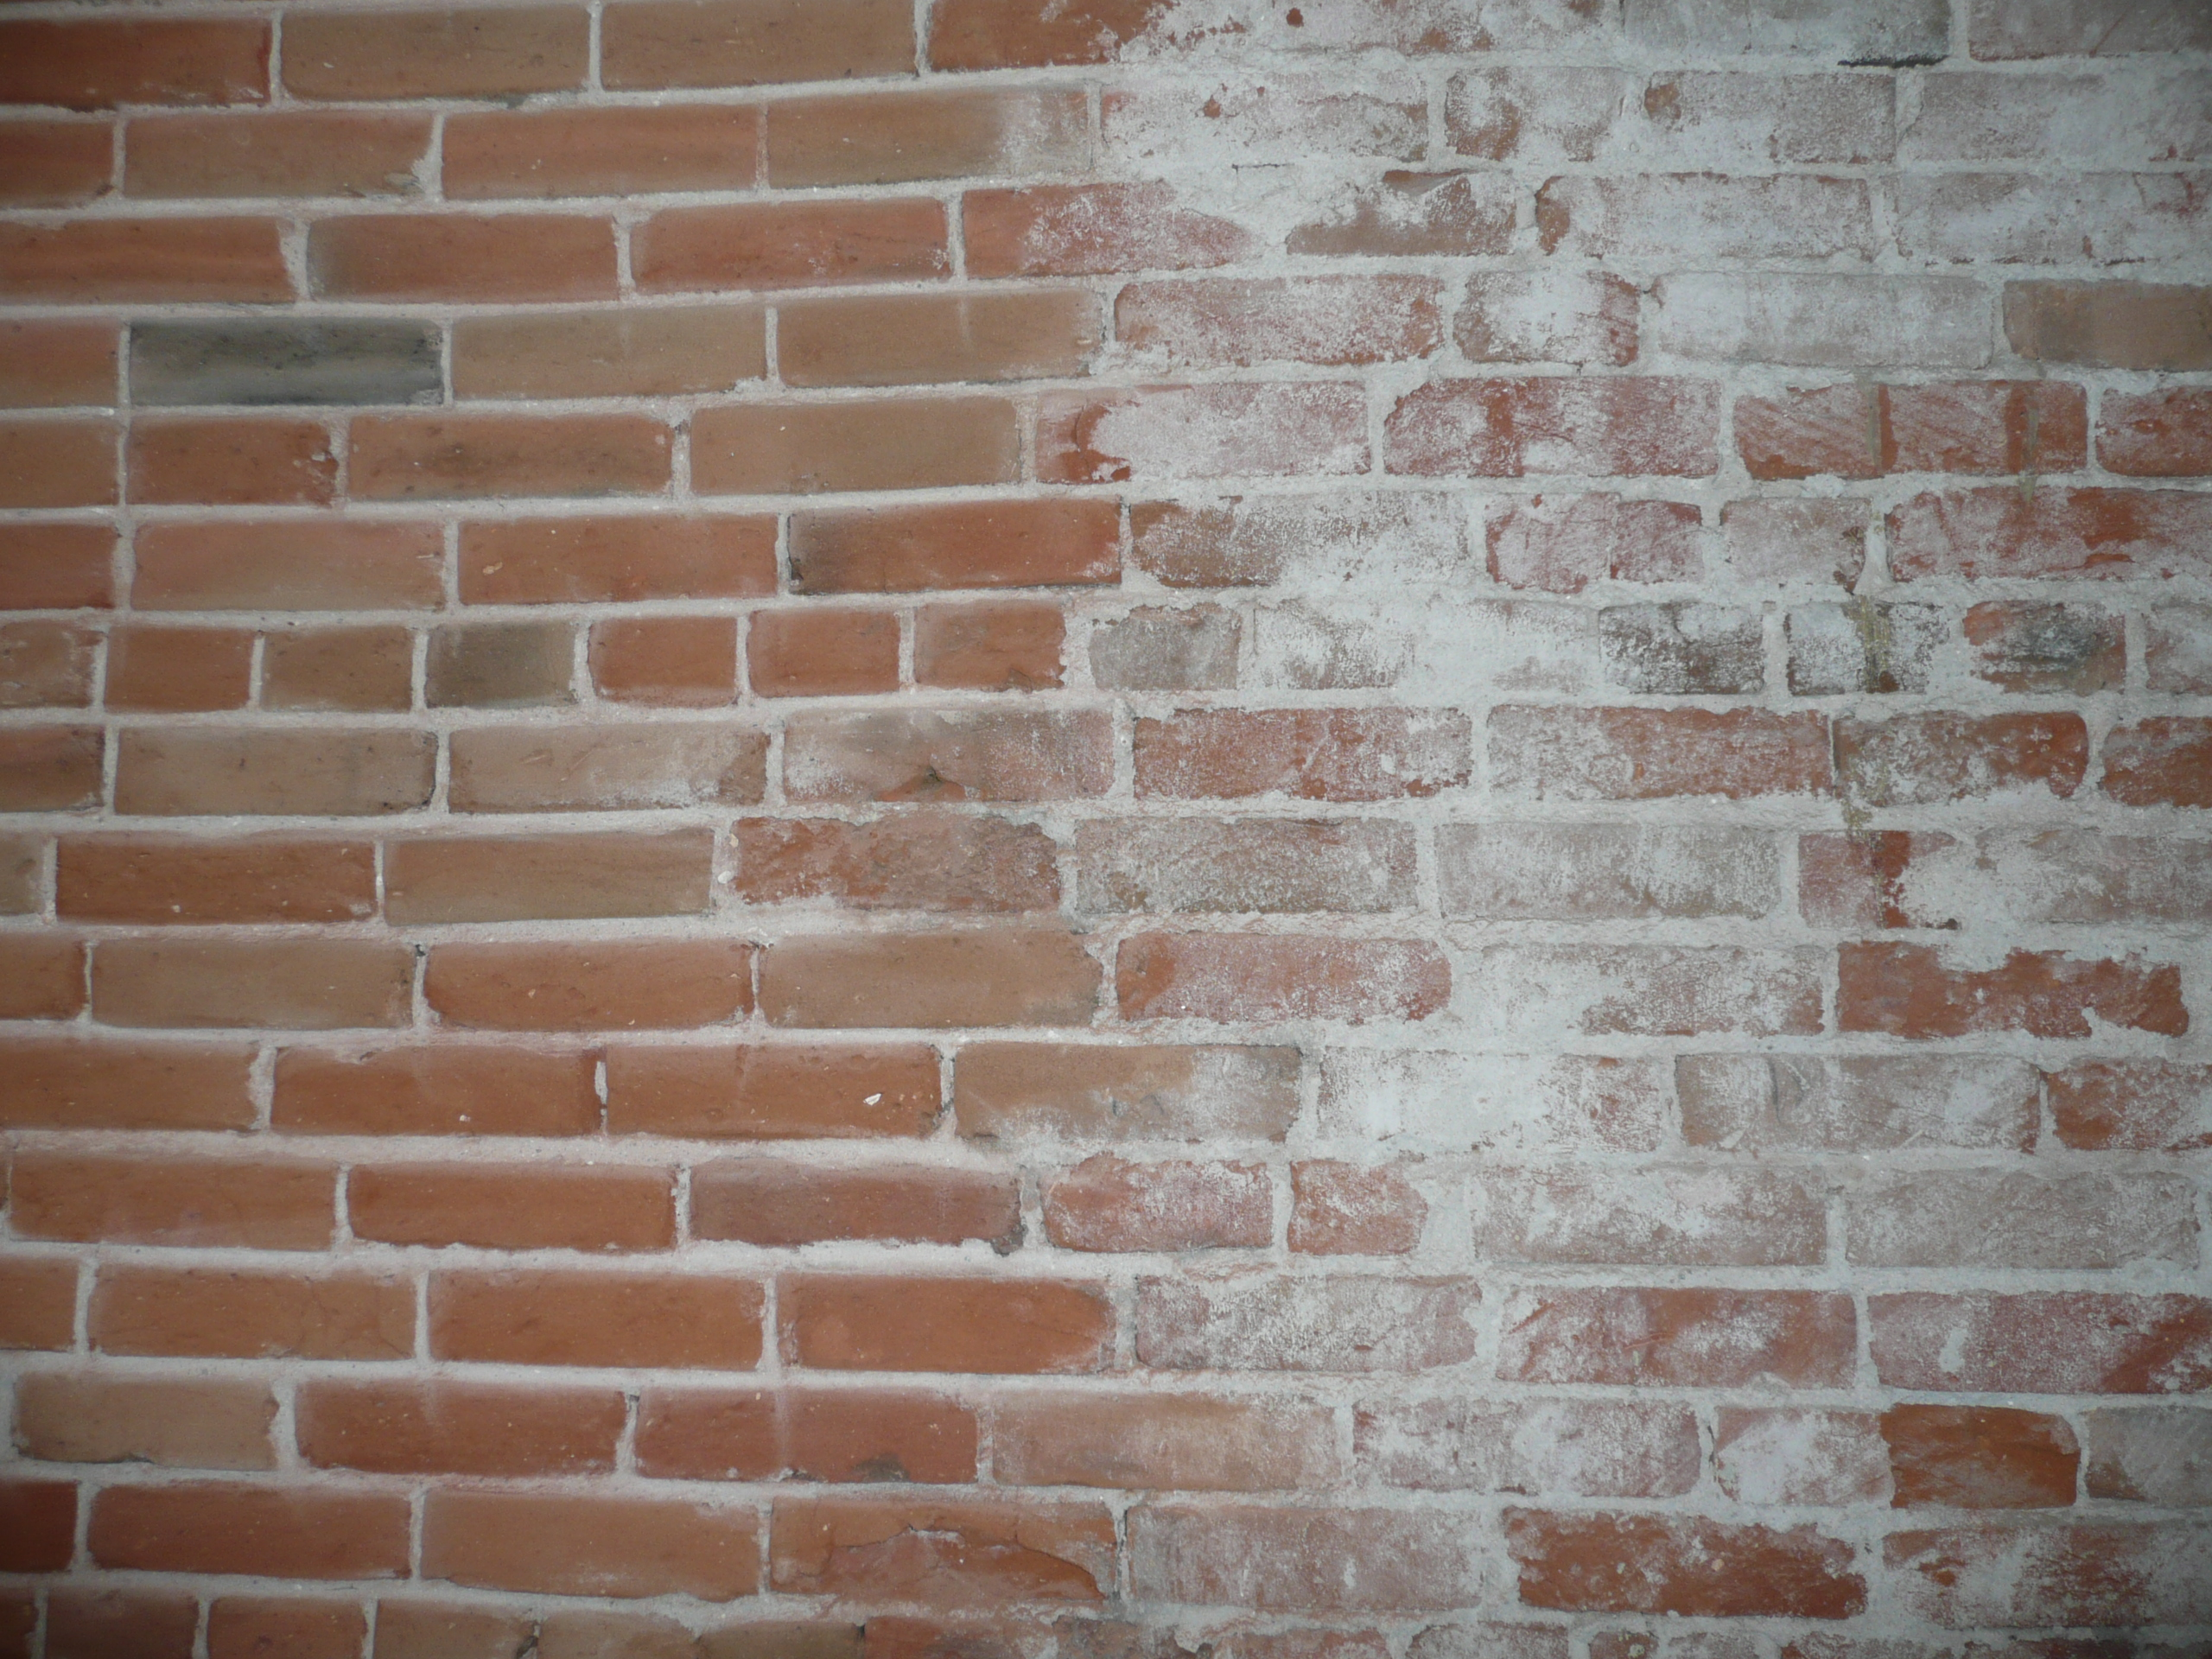 Lowes Brick Textured Wallpaper